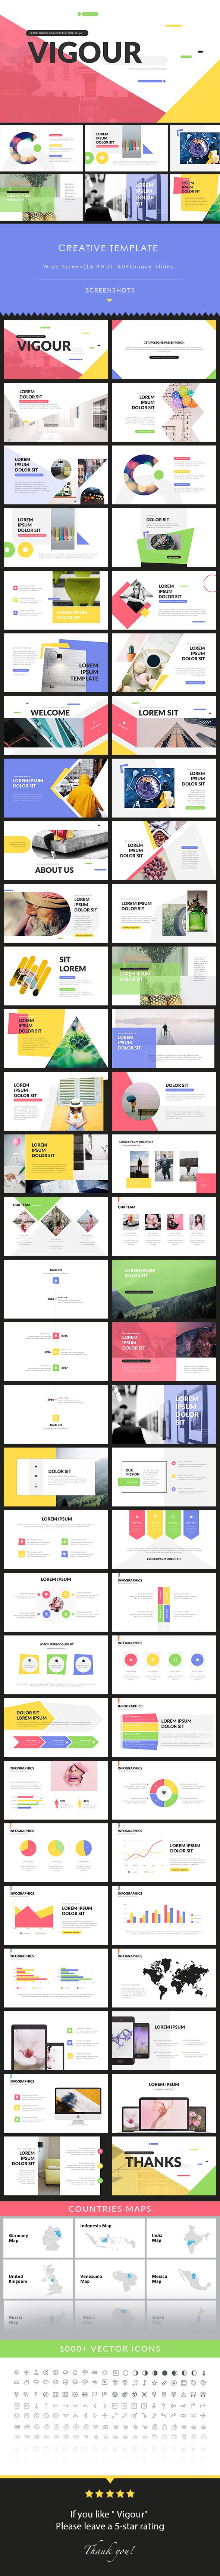 Vigour - PowerPoint Presentation Template - Creative PowerPoint Templates